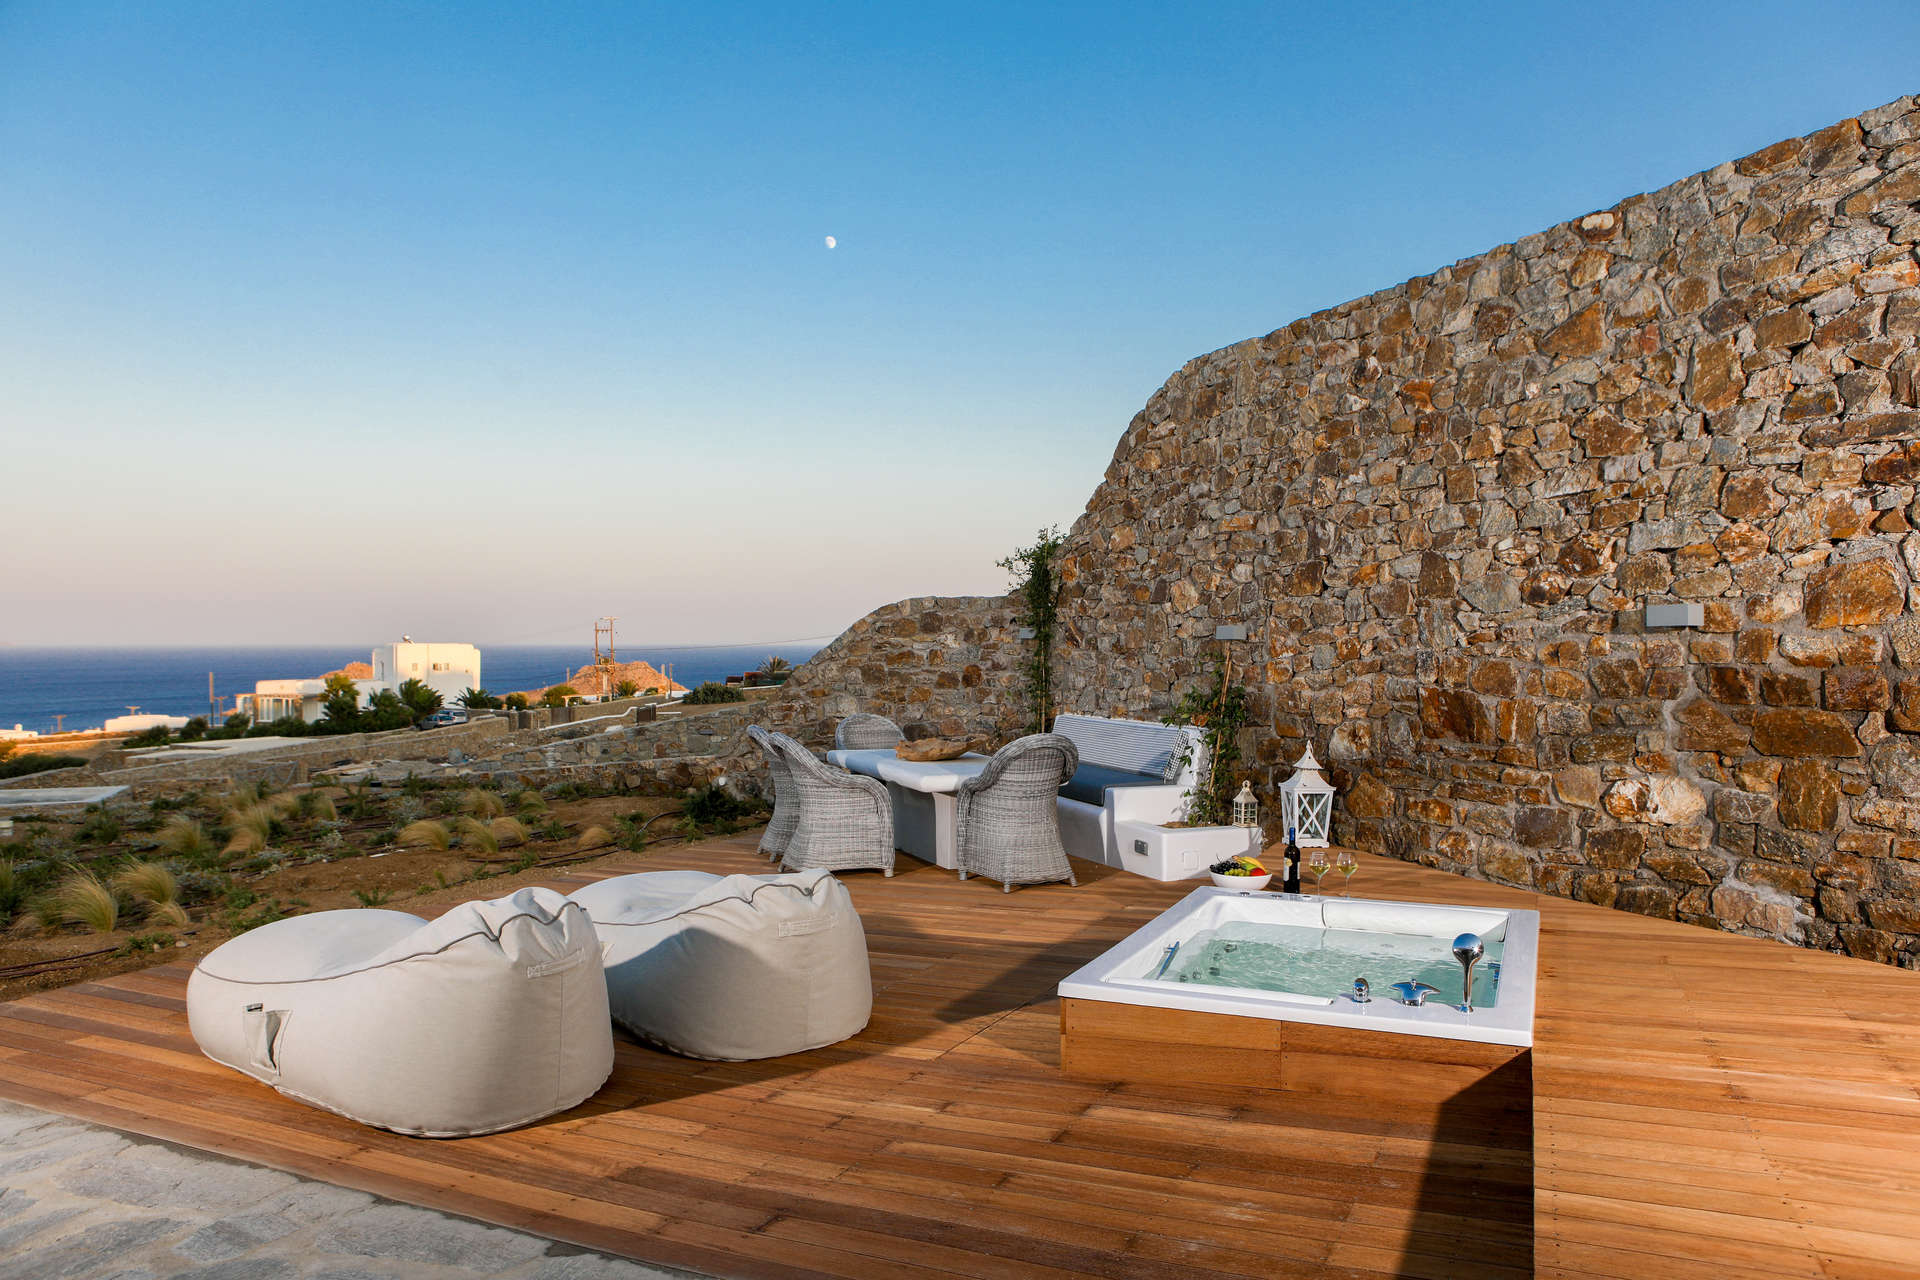 Luxury vacation rentals europe - Greece - Mykonos - Kalafatis - Annie House - Image 1/9